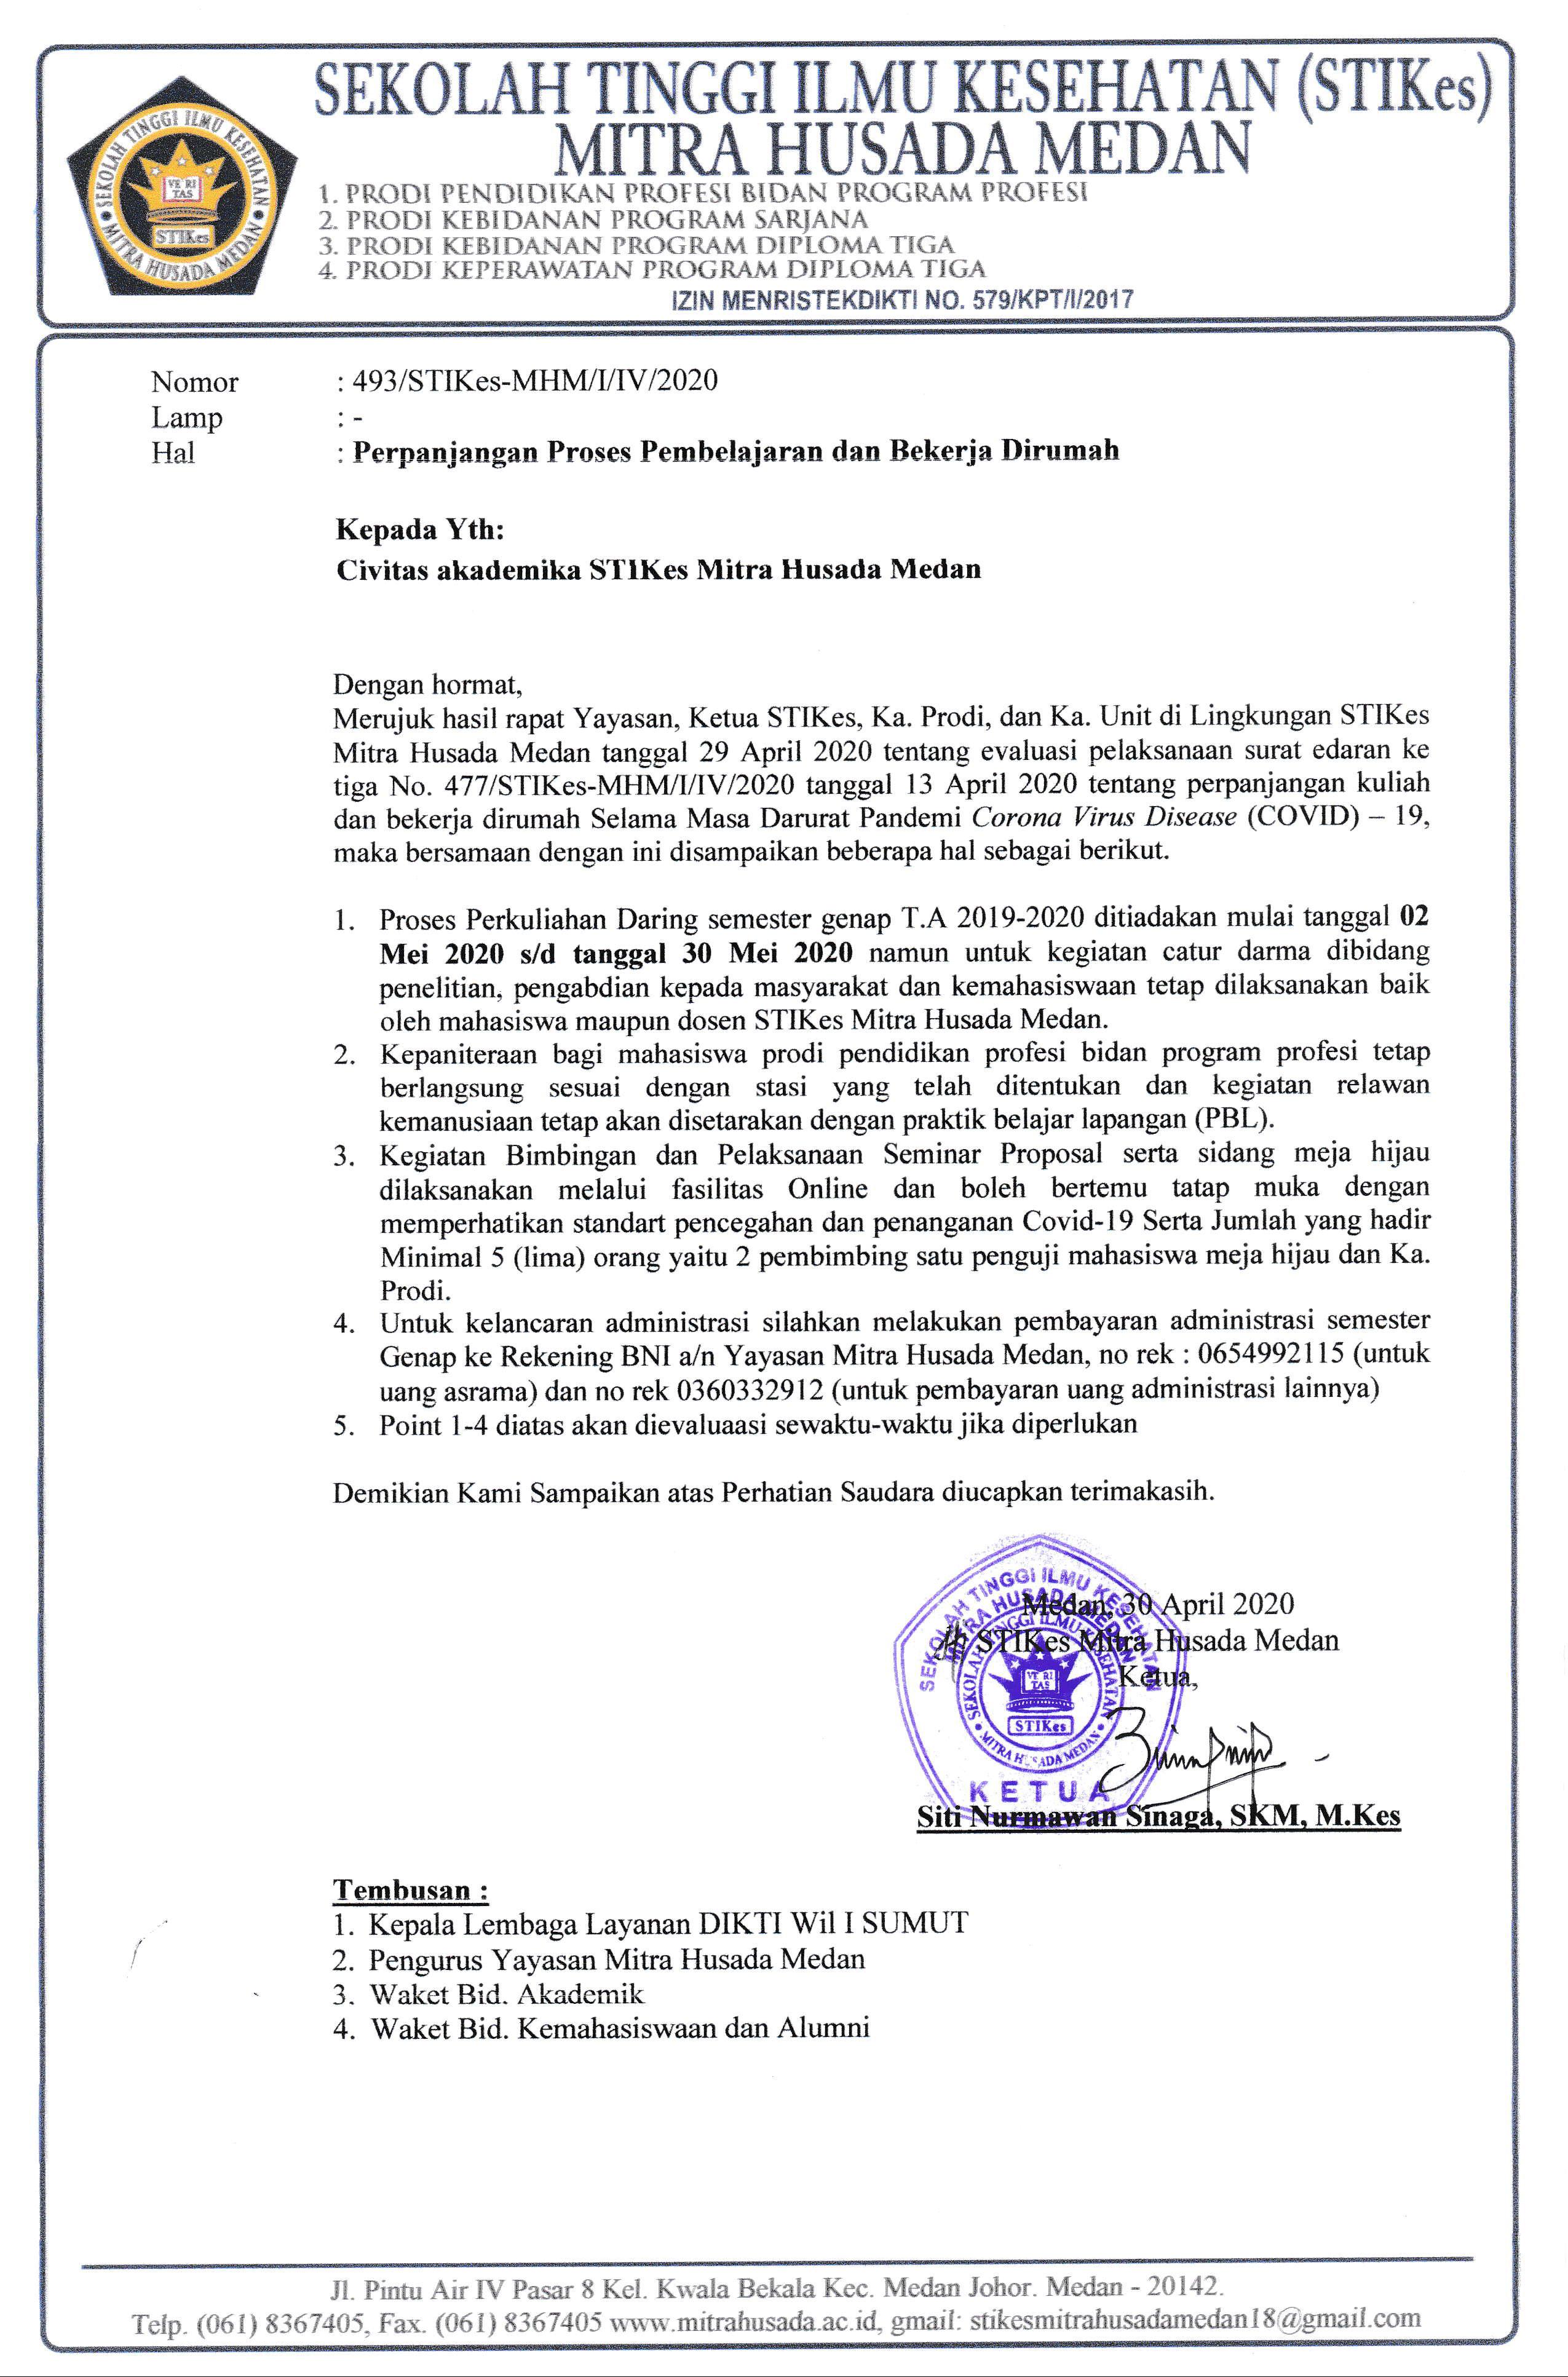 Surat Edaran Tentang Perpanjangan Proses Pembelajaran dan Bekerja Dirumah Selama Masa Darurat Pandemi Covid-19